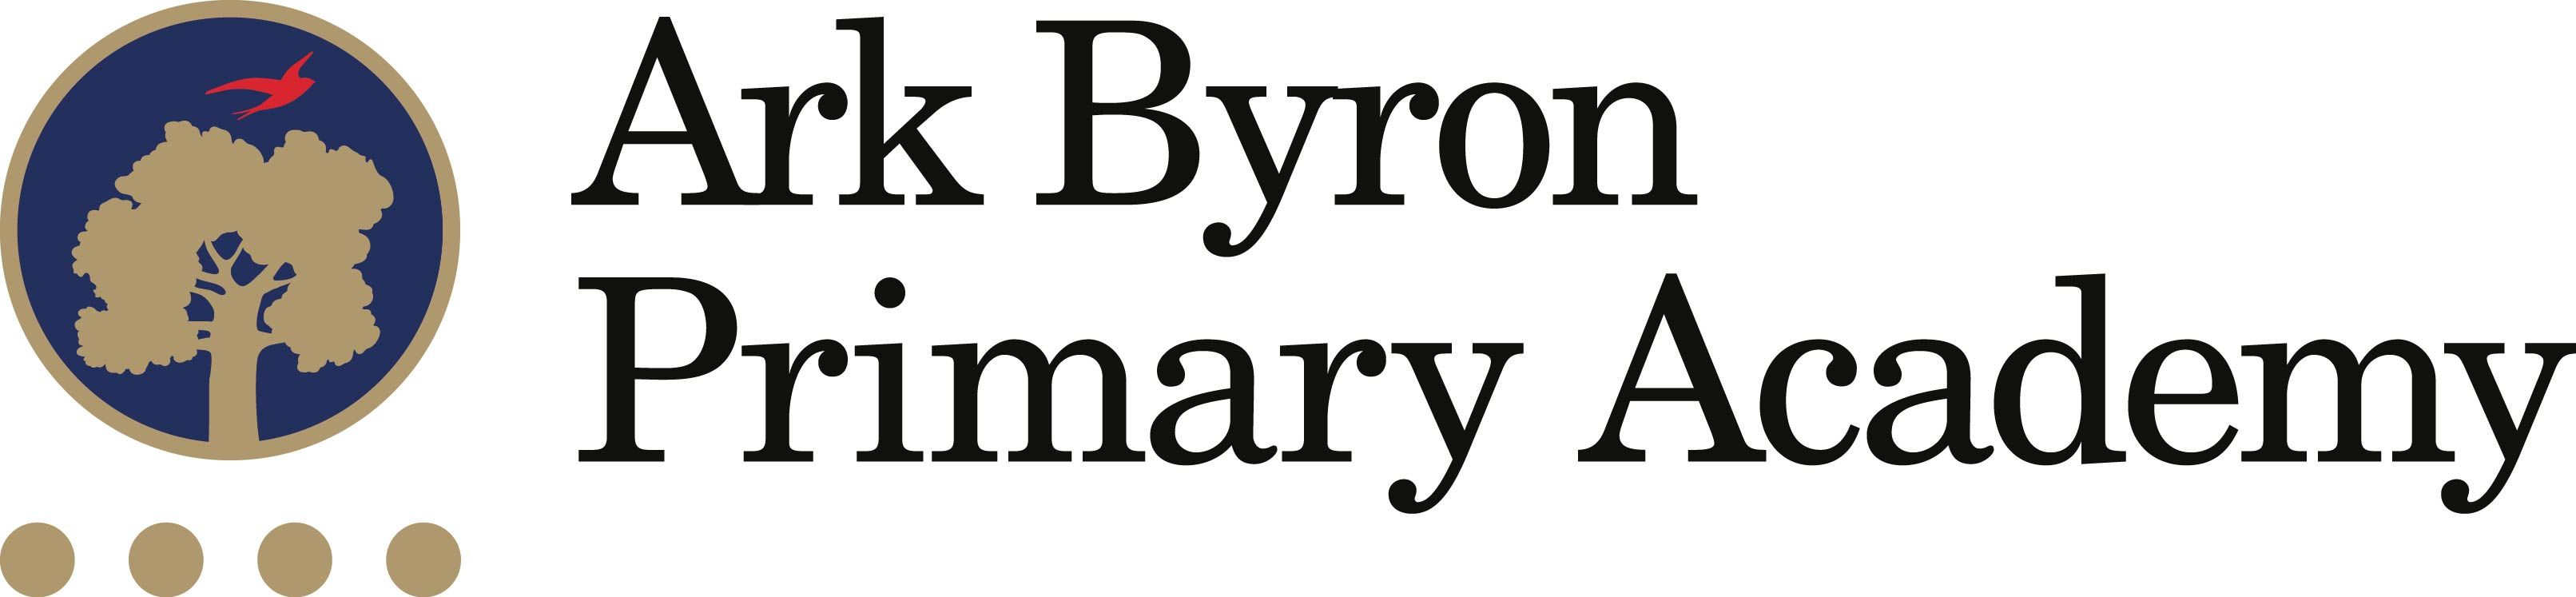 Ark Byron Primary Academy logo design. Using existing school colour scheme.